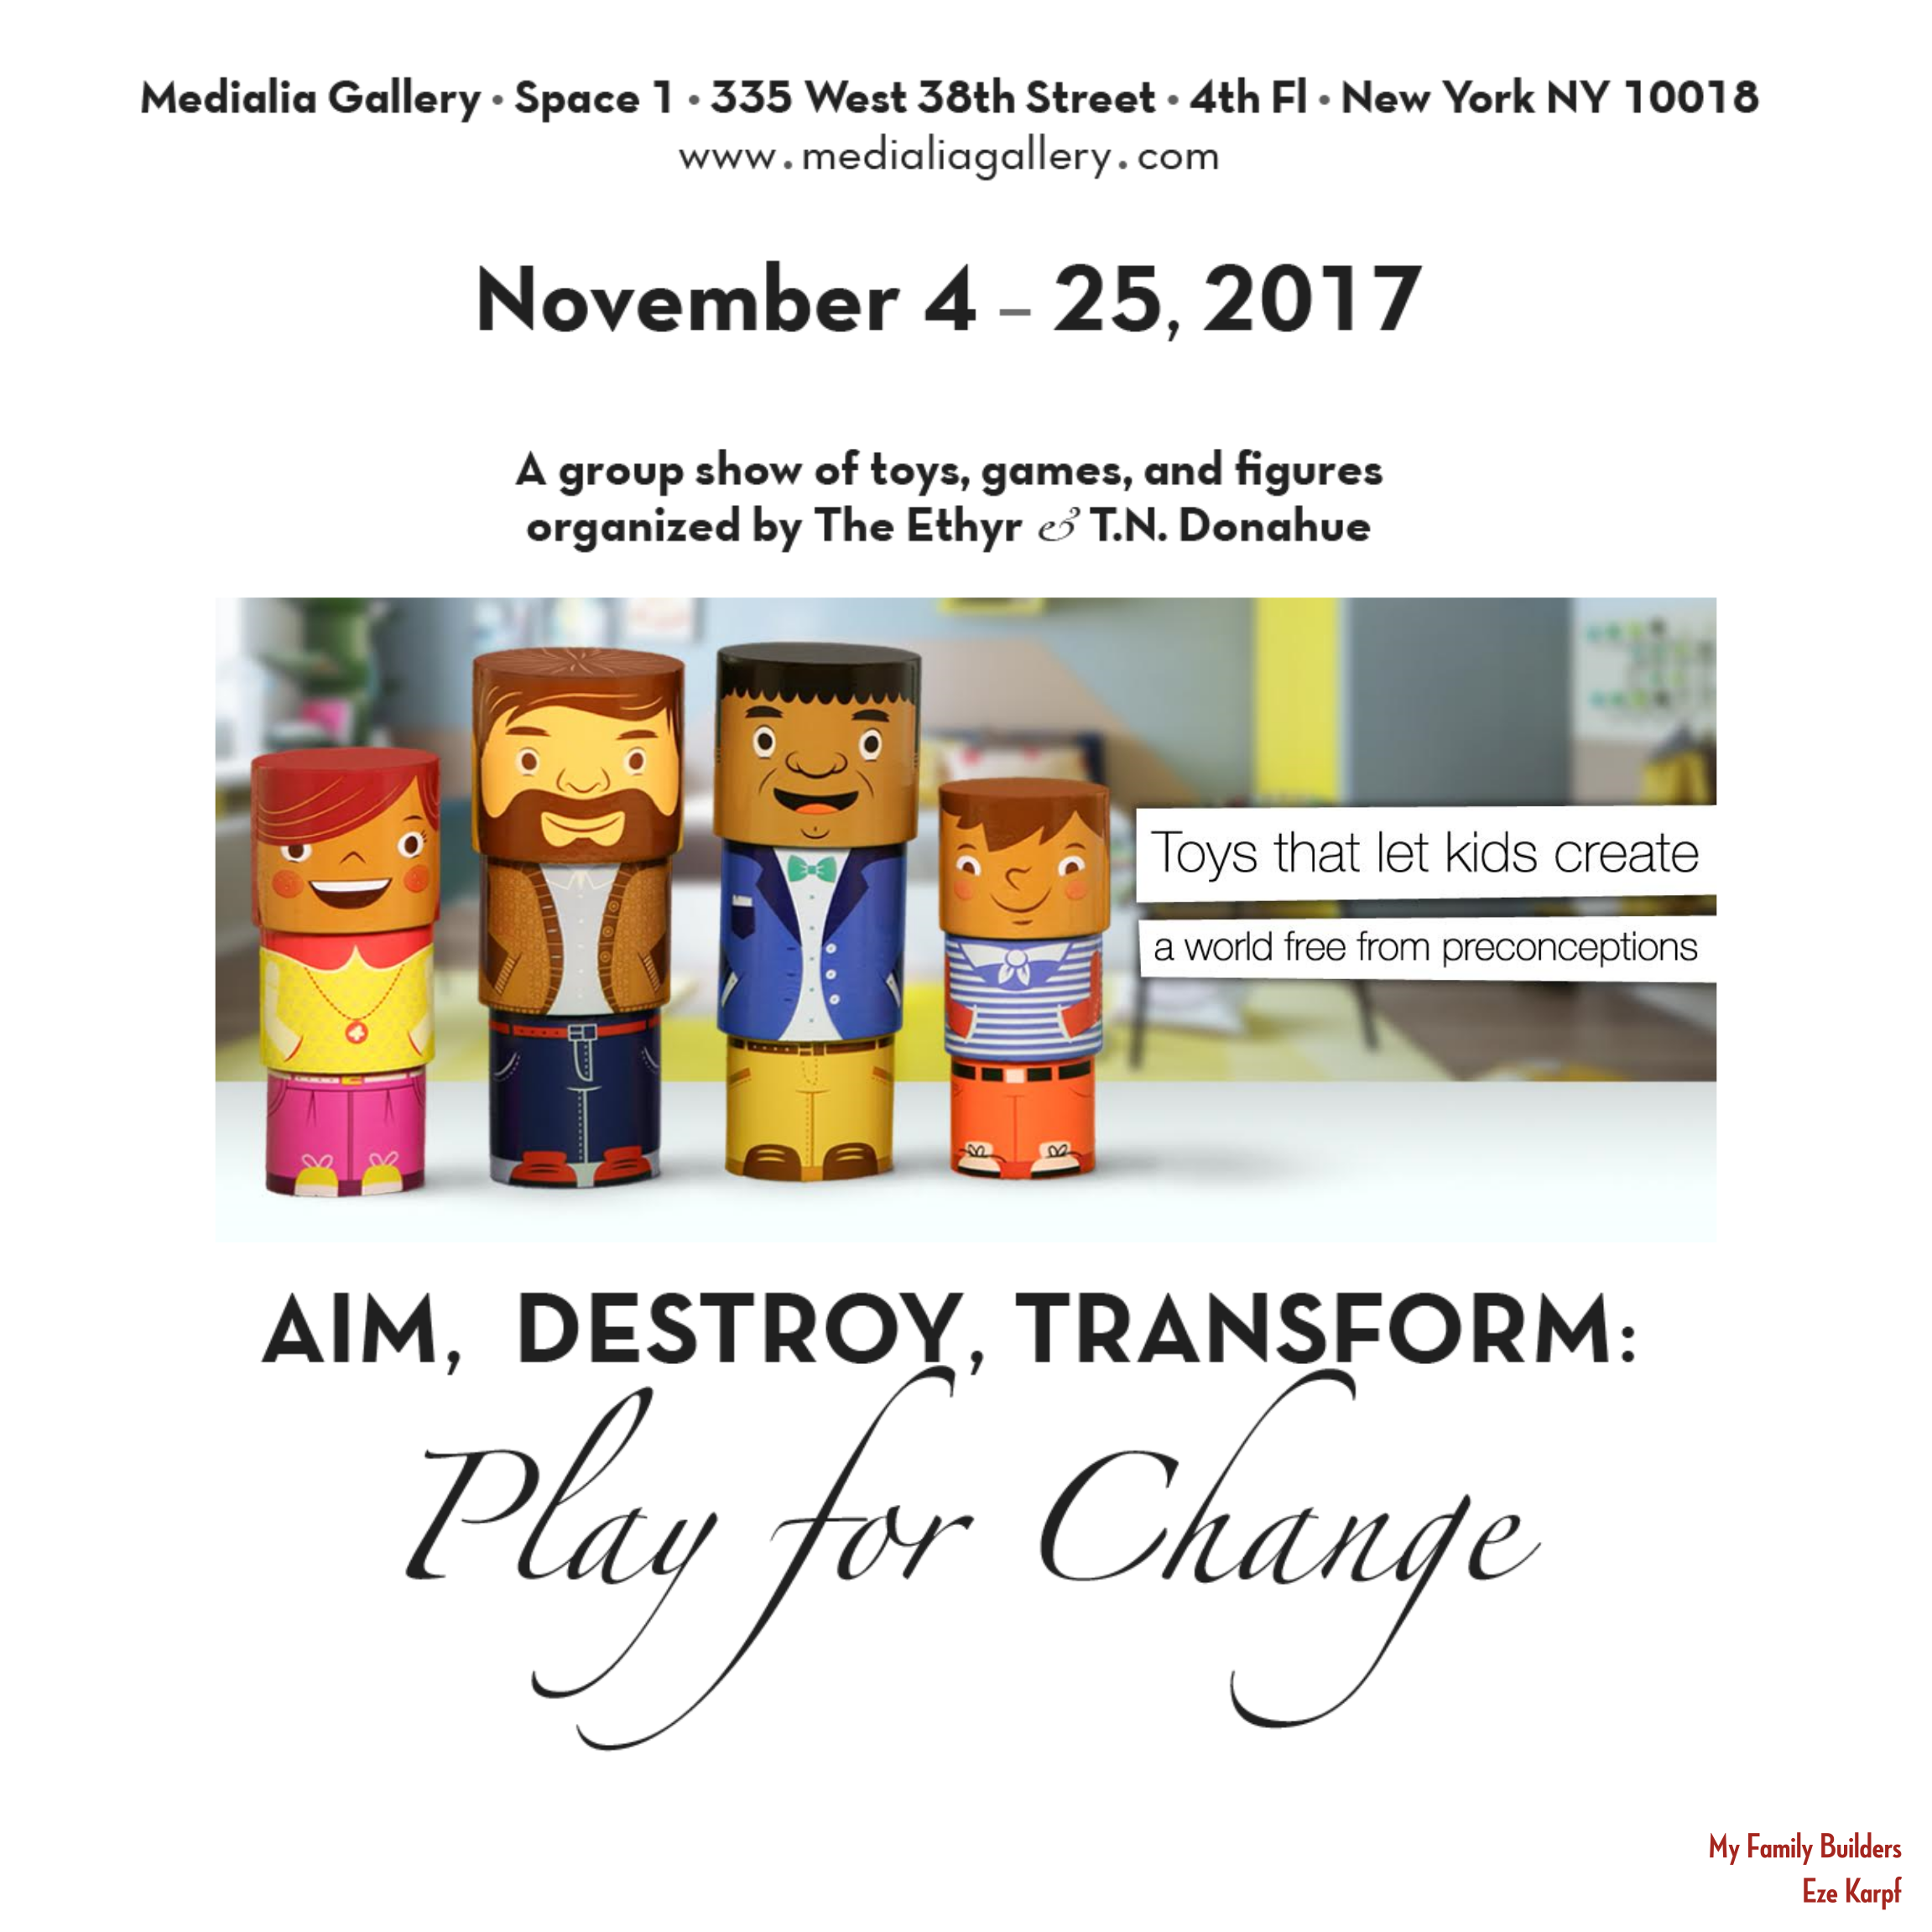 MedialiaGallery_The_Ethyr_AimDestroyTransform_Toy_Show_announcement_MyFamilyBuilders_EzeKarpf_November_2017.jpg.png